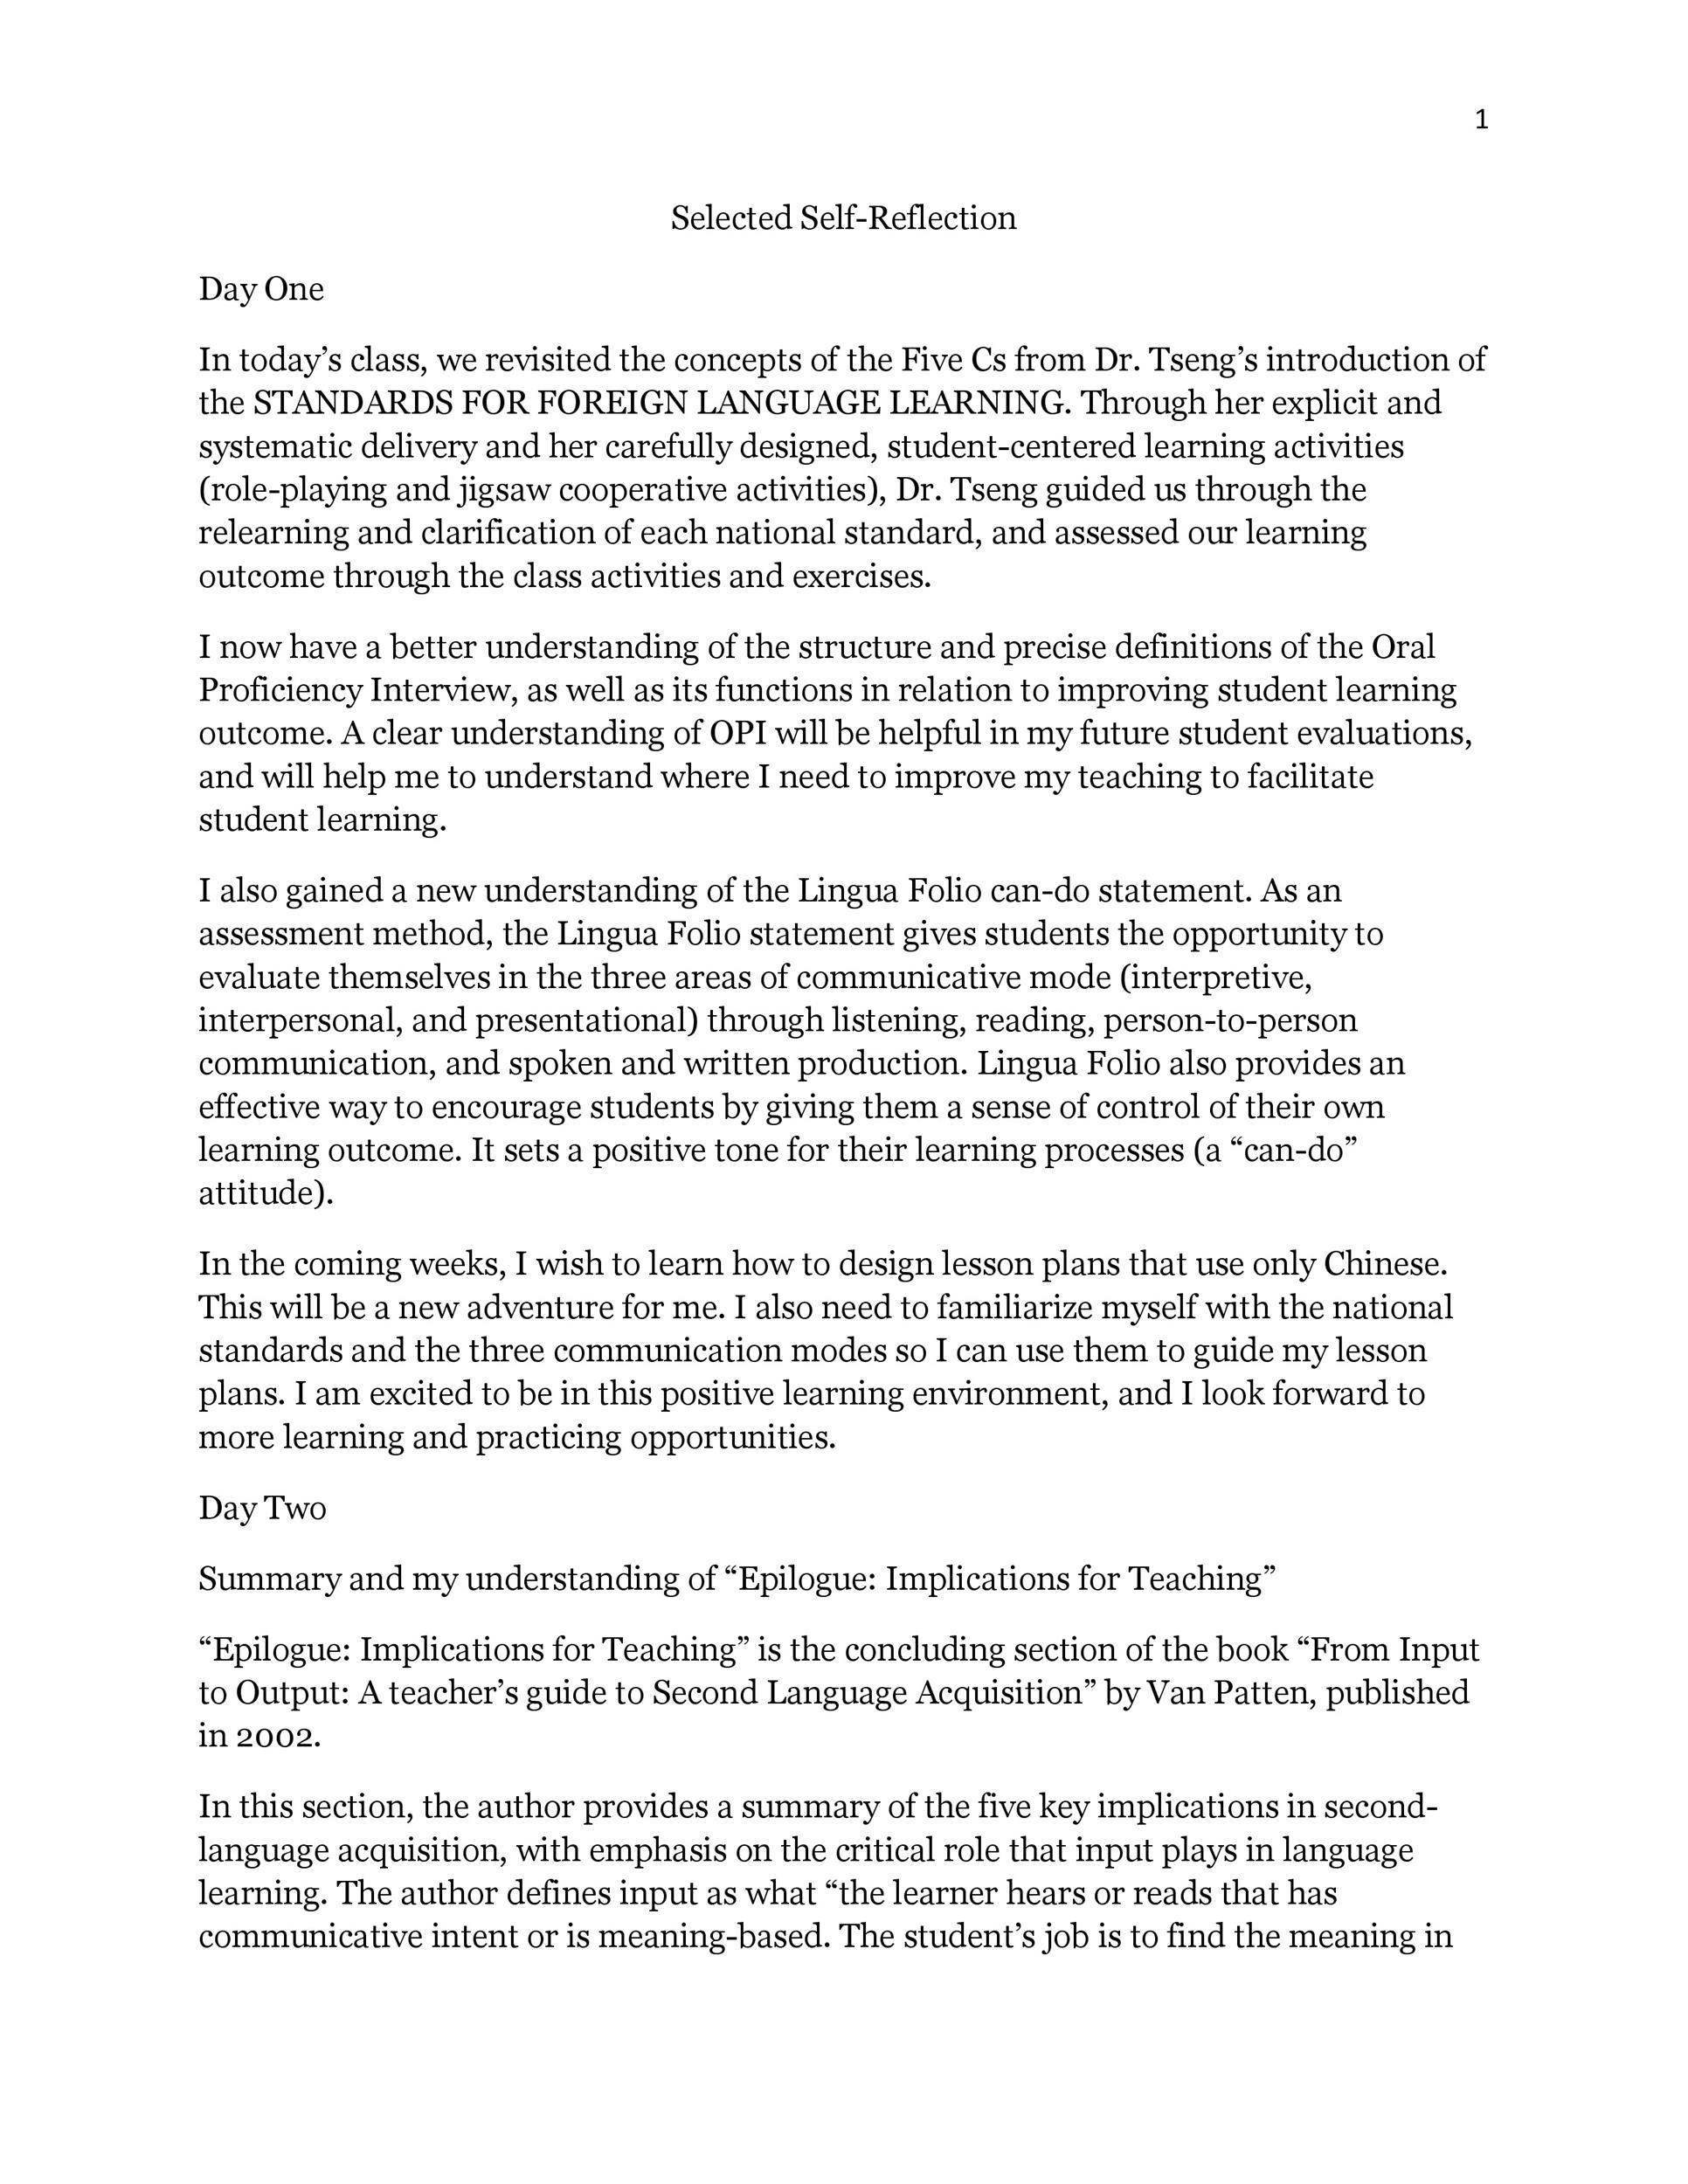 Free reflective essay example 12